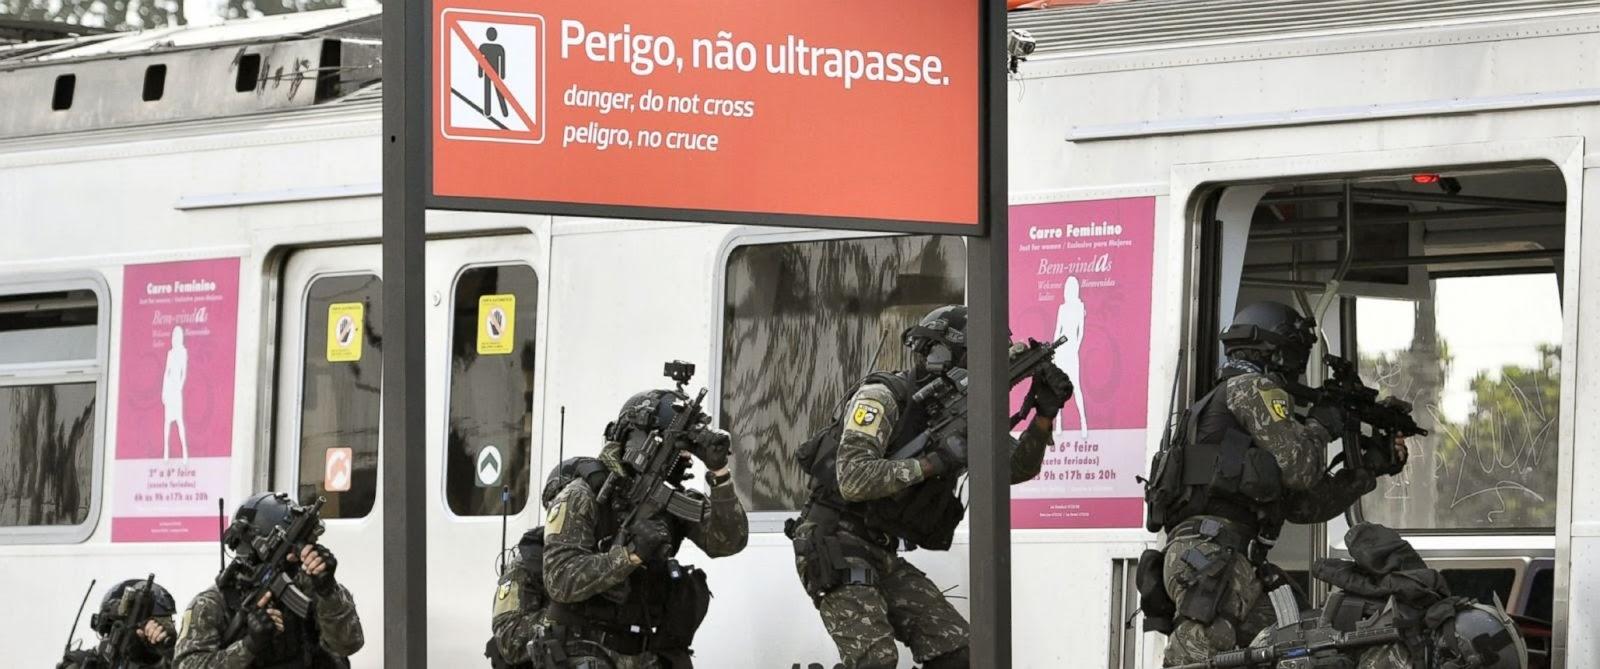 RIO OLYMPICS 2016 E